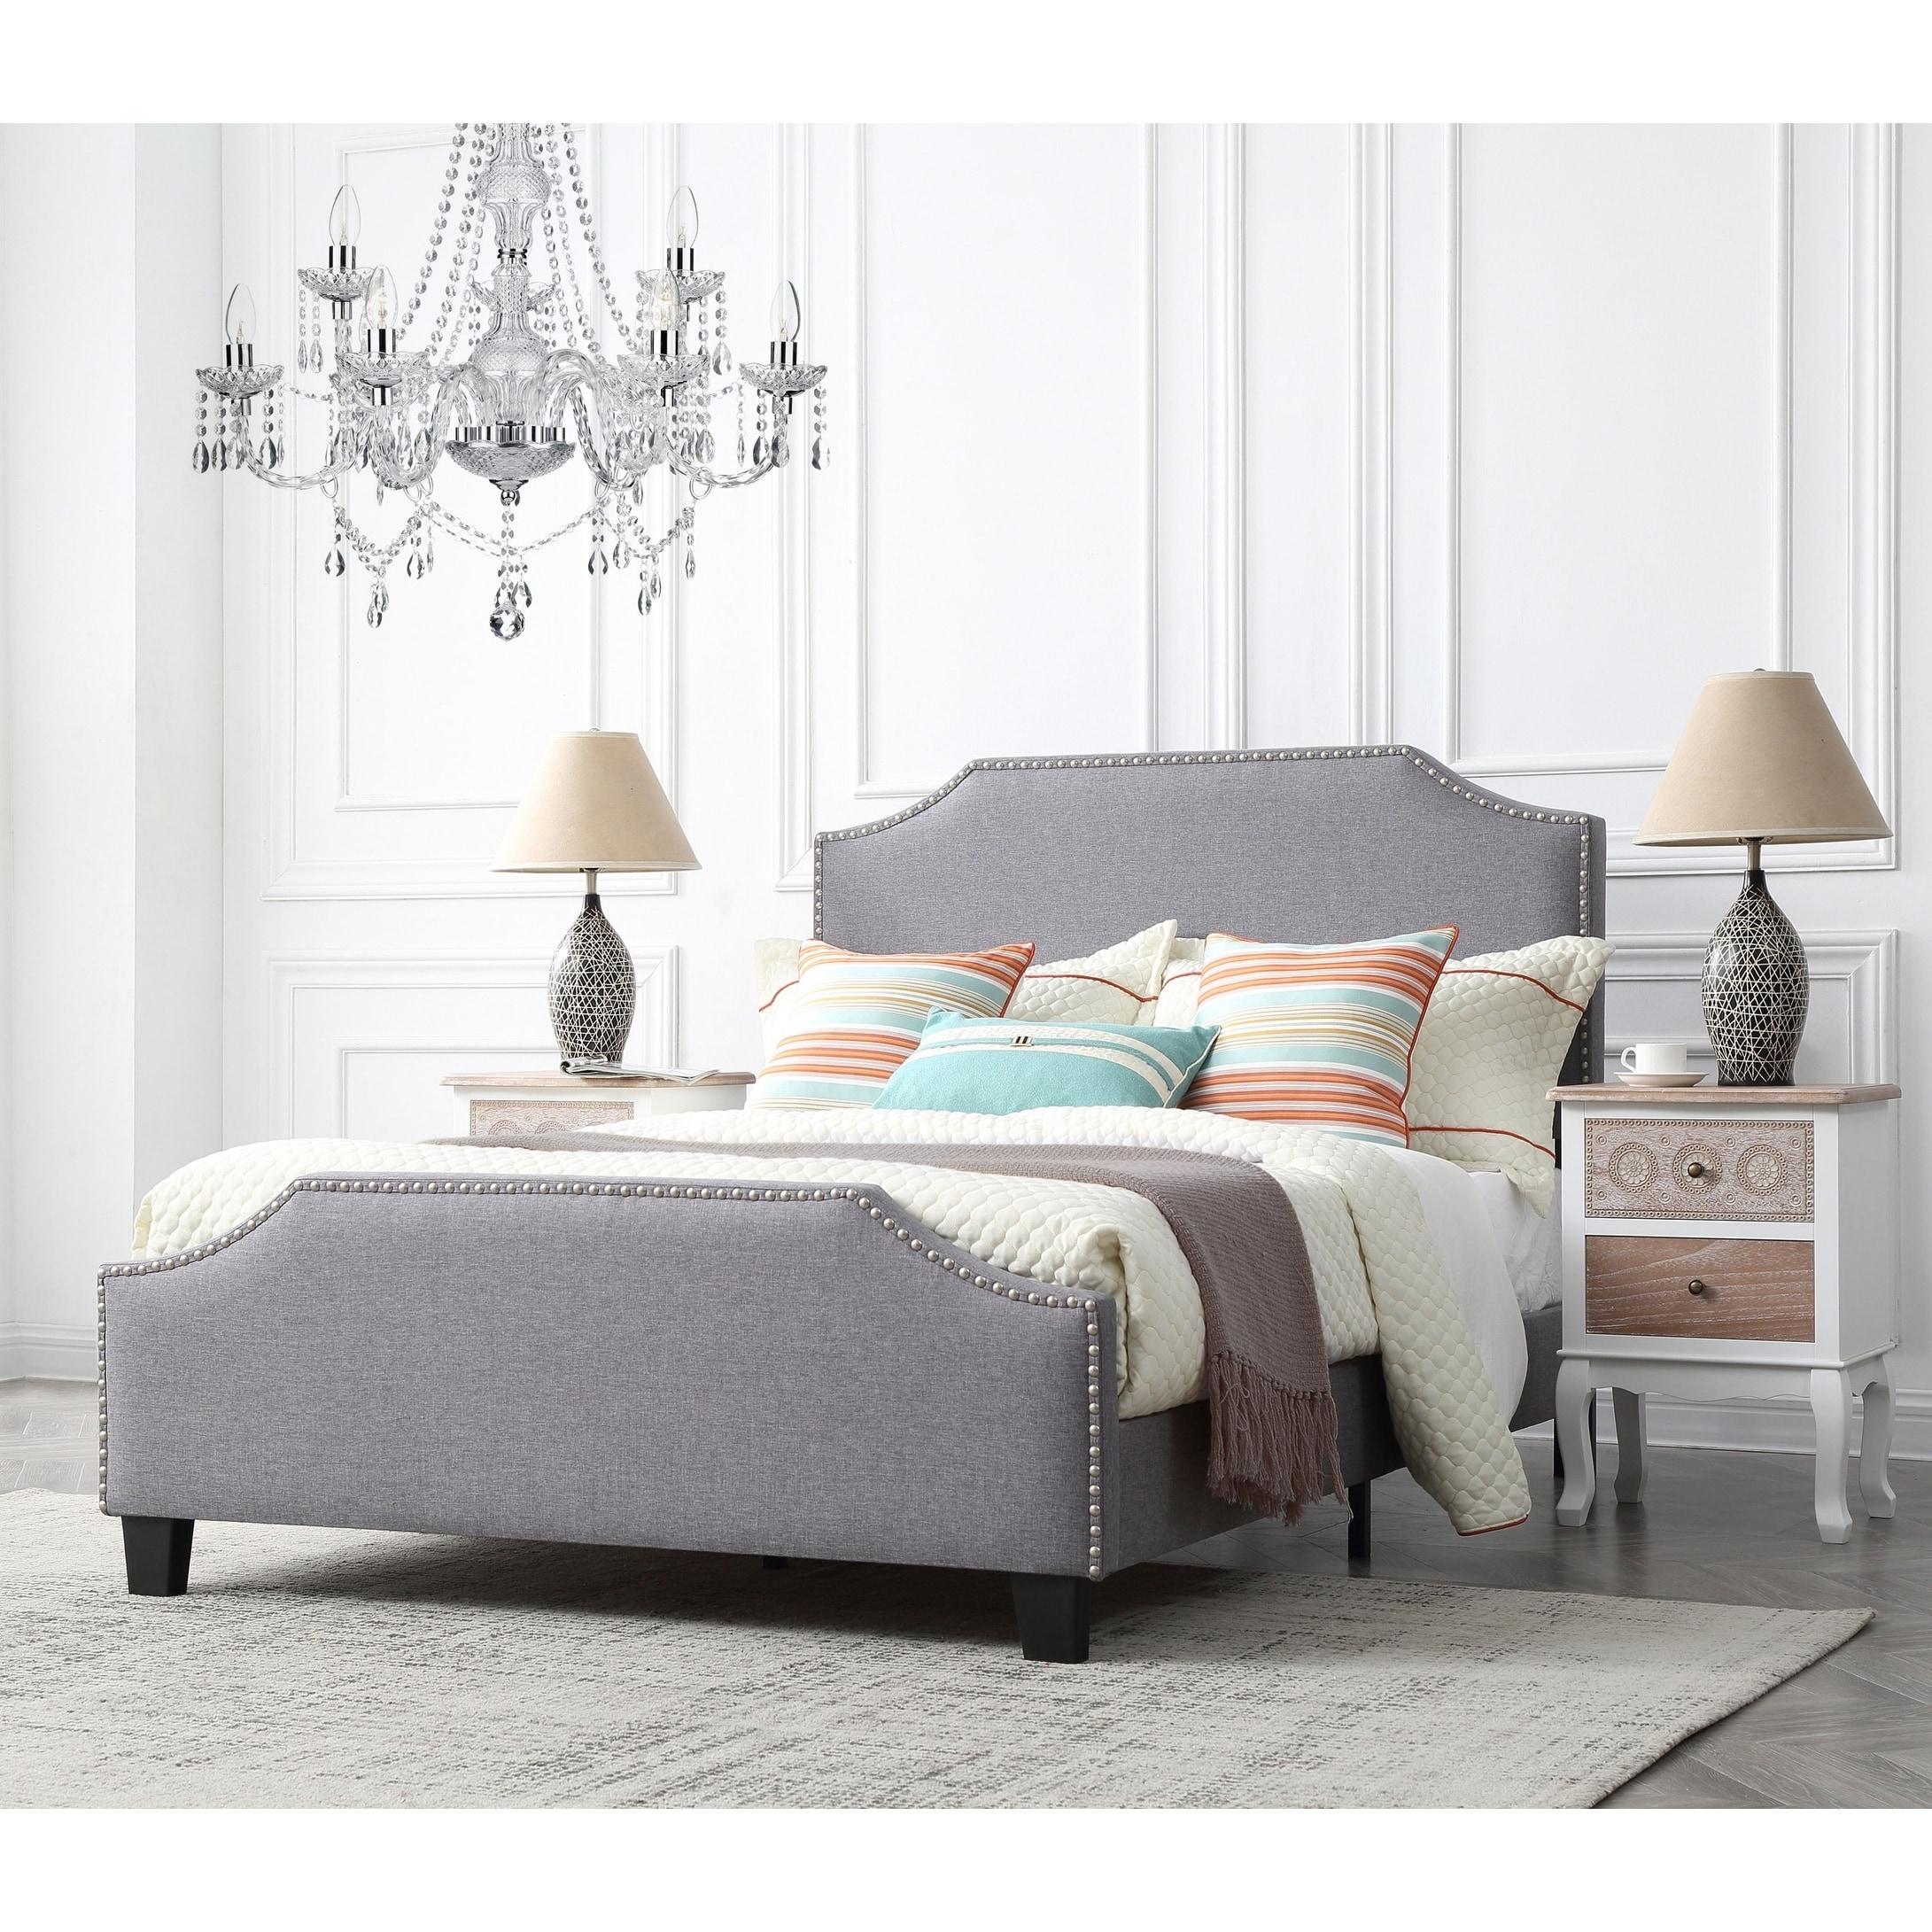 Caroline Platinum Upholstered Full Bed with Nailhead Trim